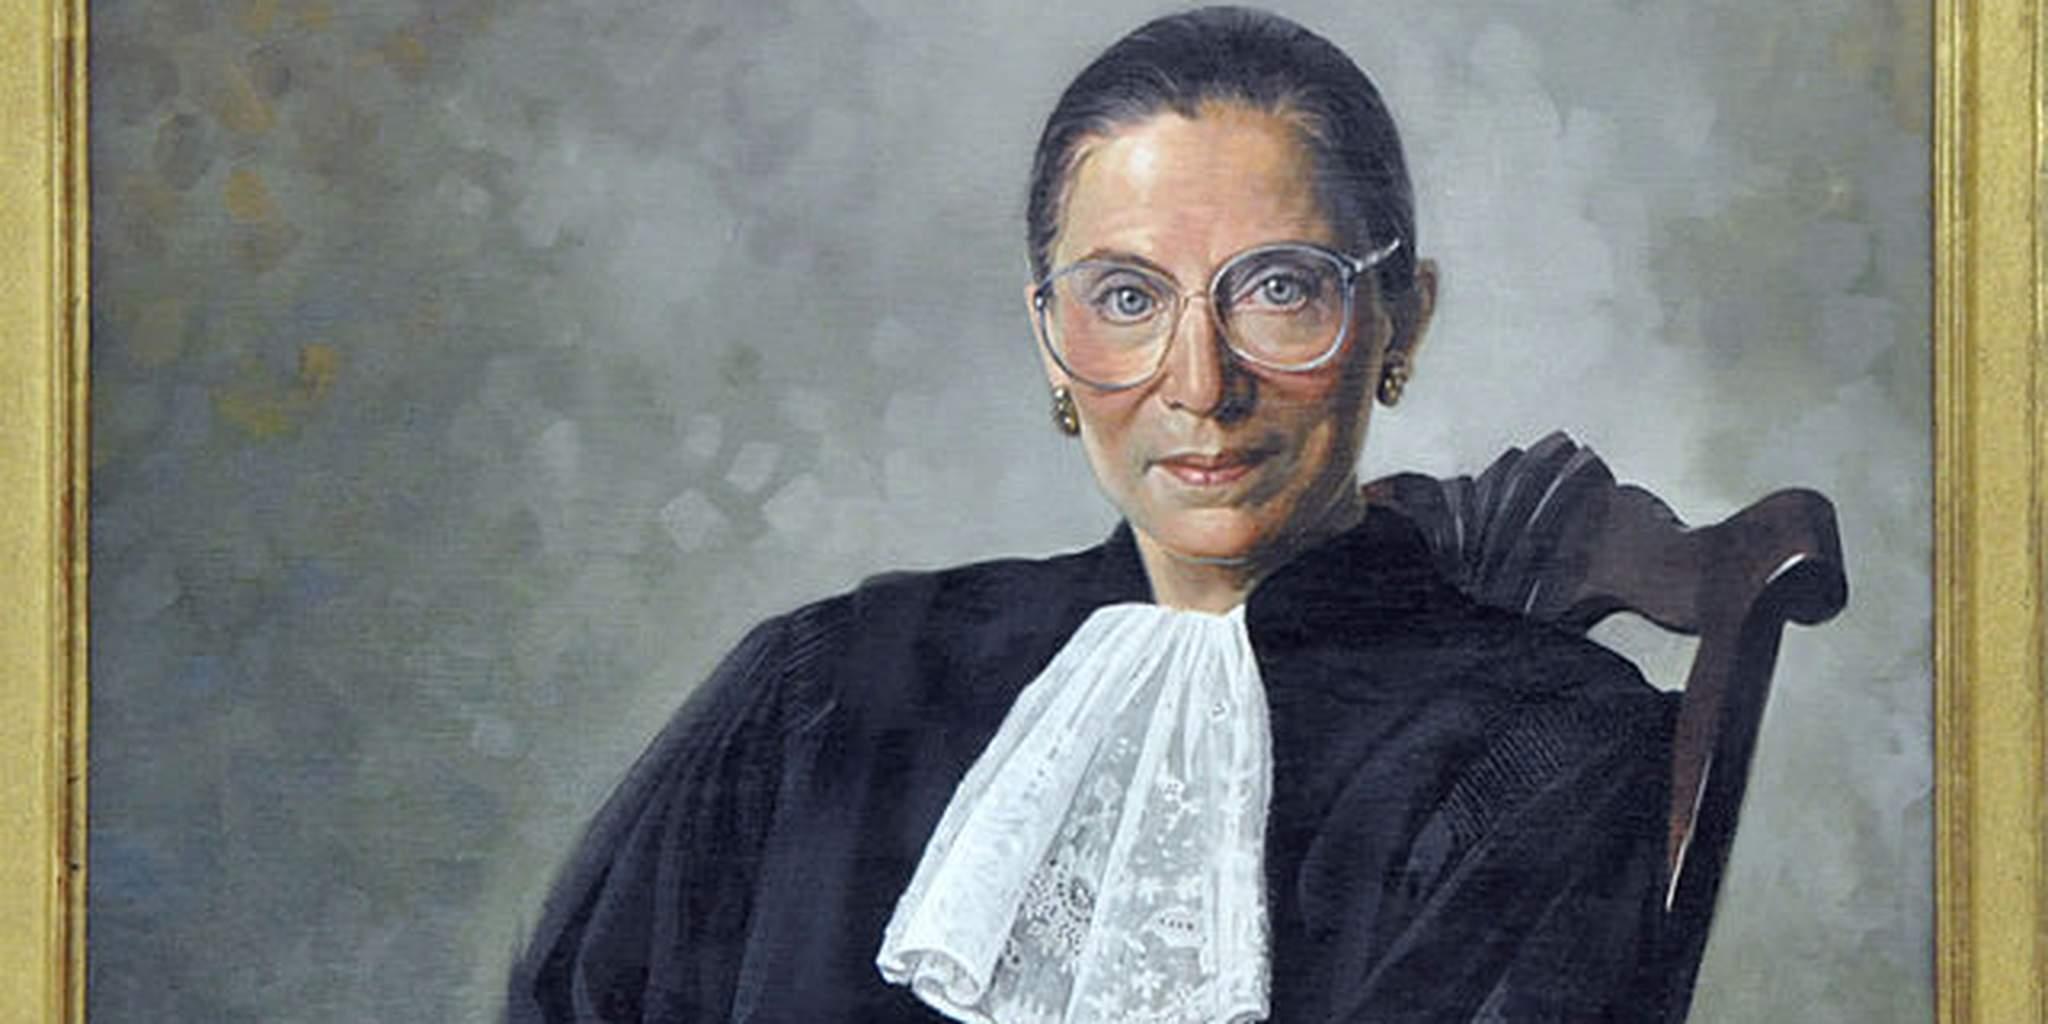 Ruth Bader Ginsberg portrait